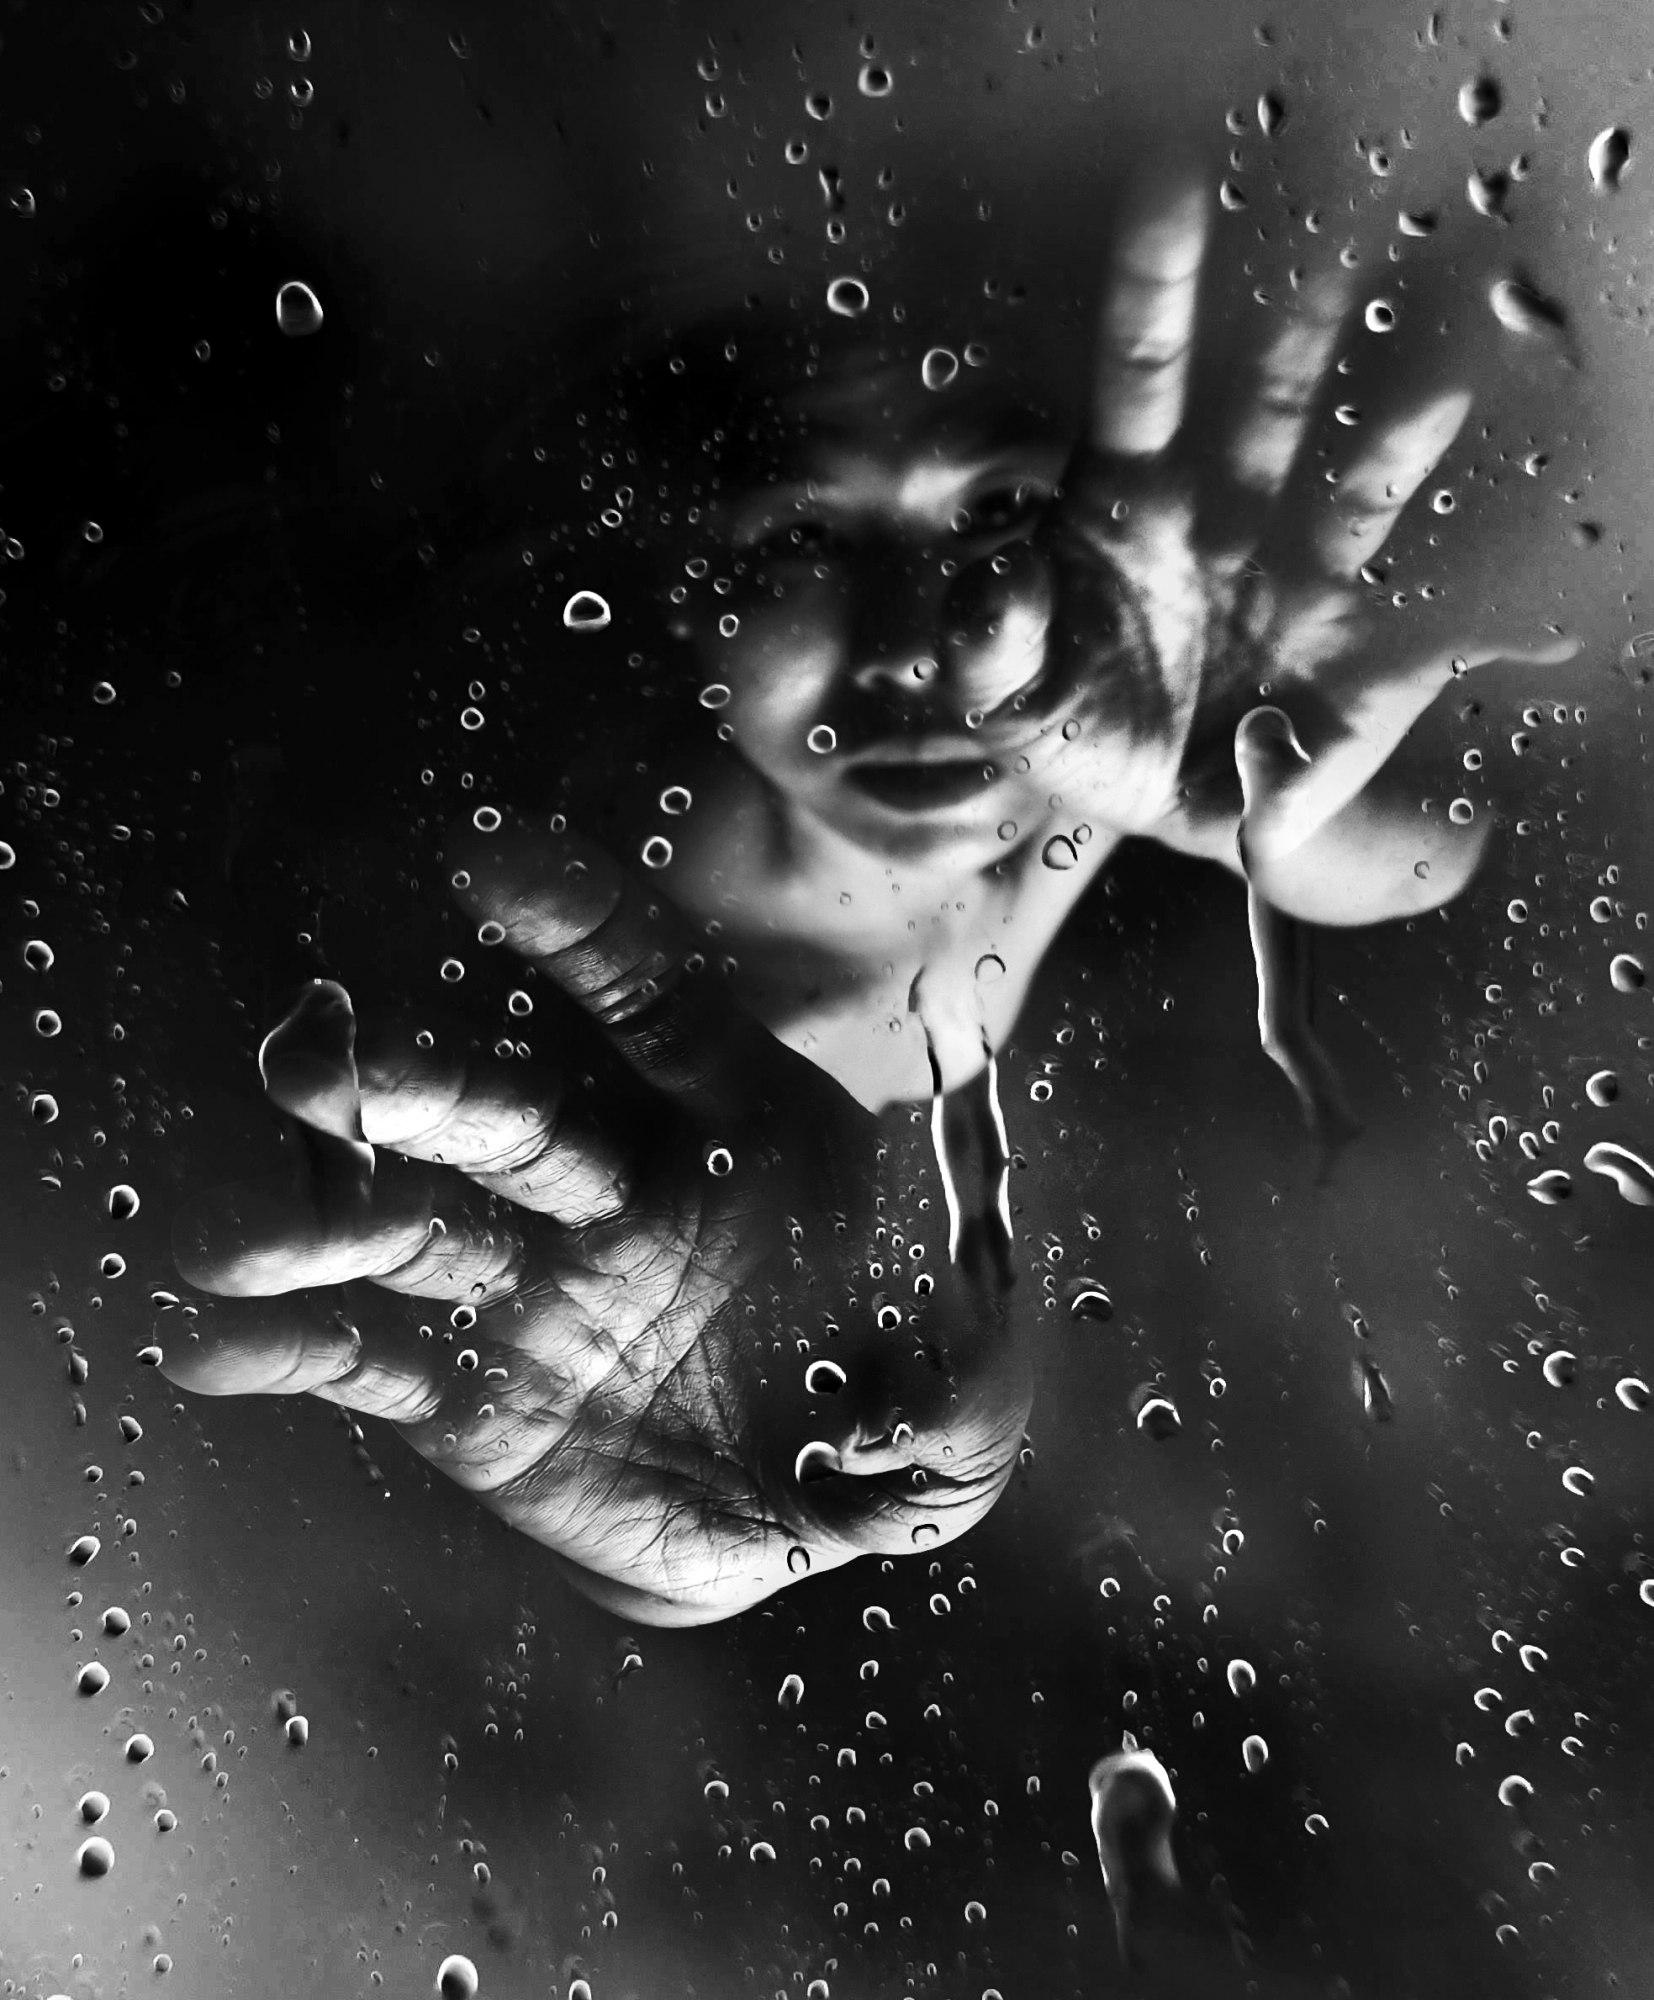 2019 / Rainy / 10x12 cm / Photo by Suelynee 何書伶